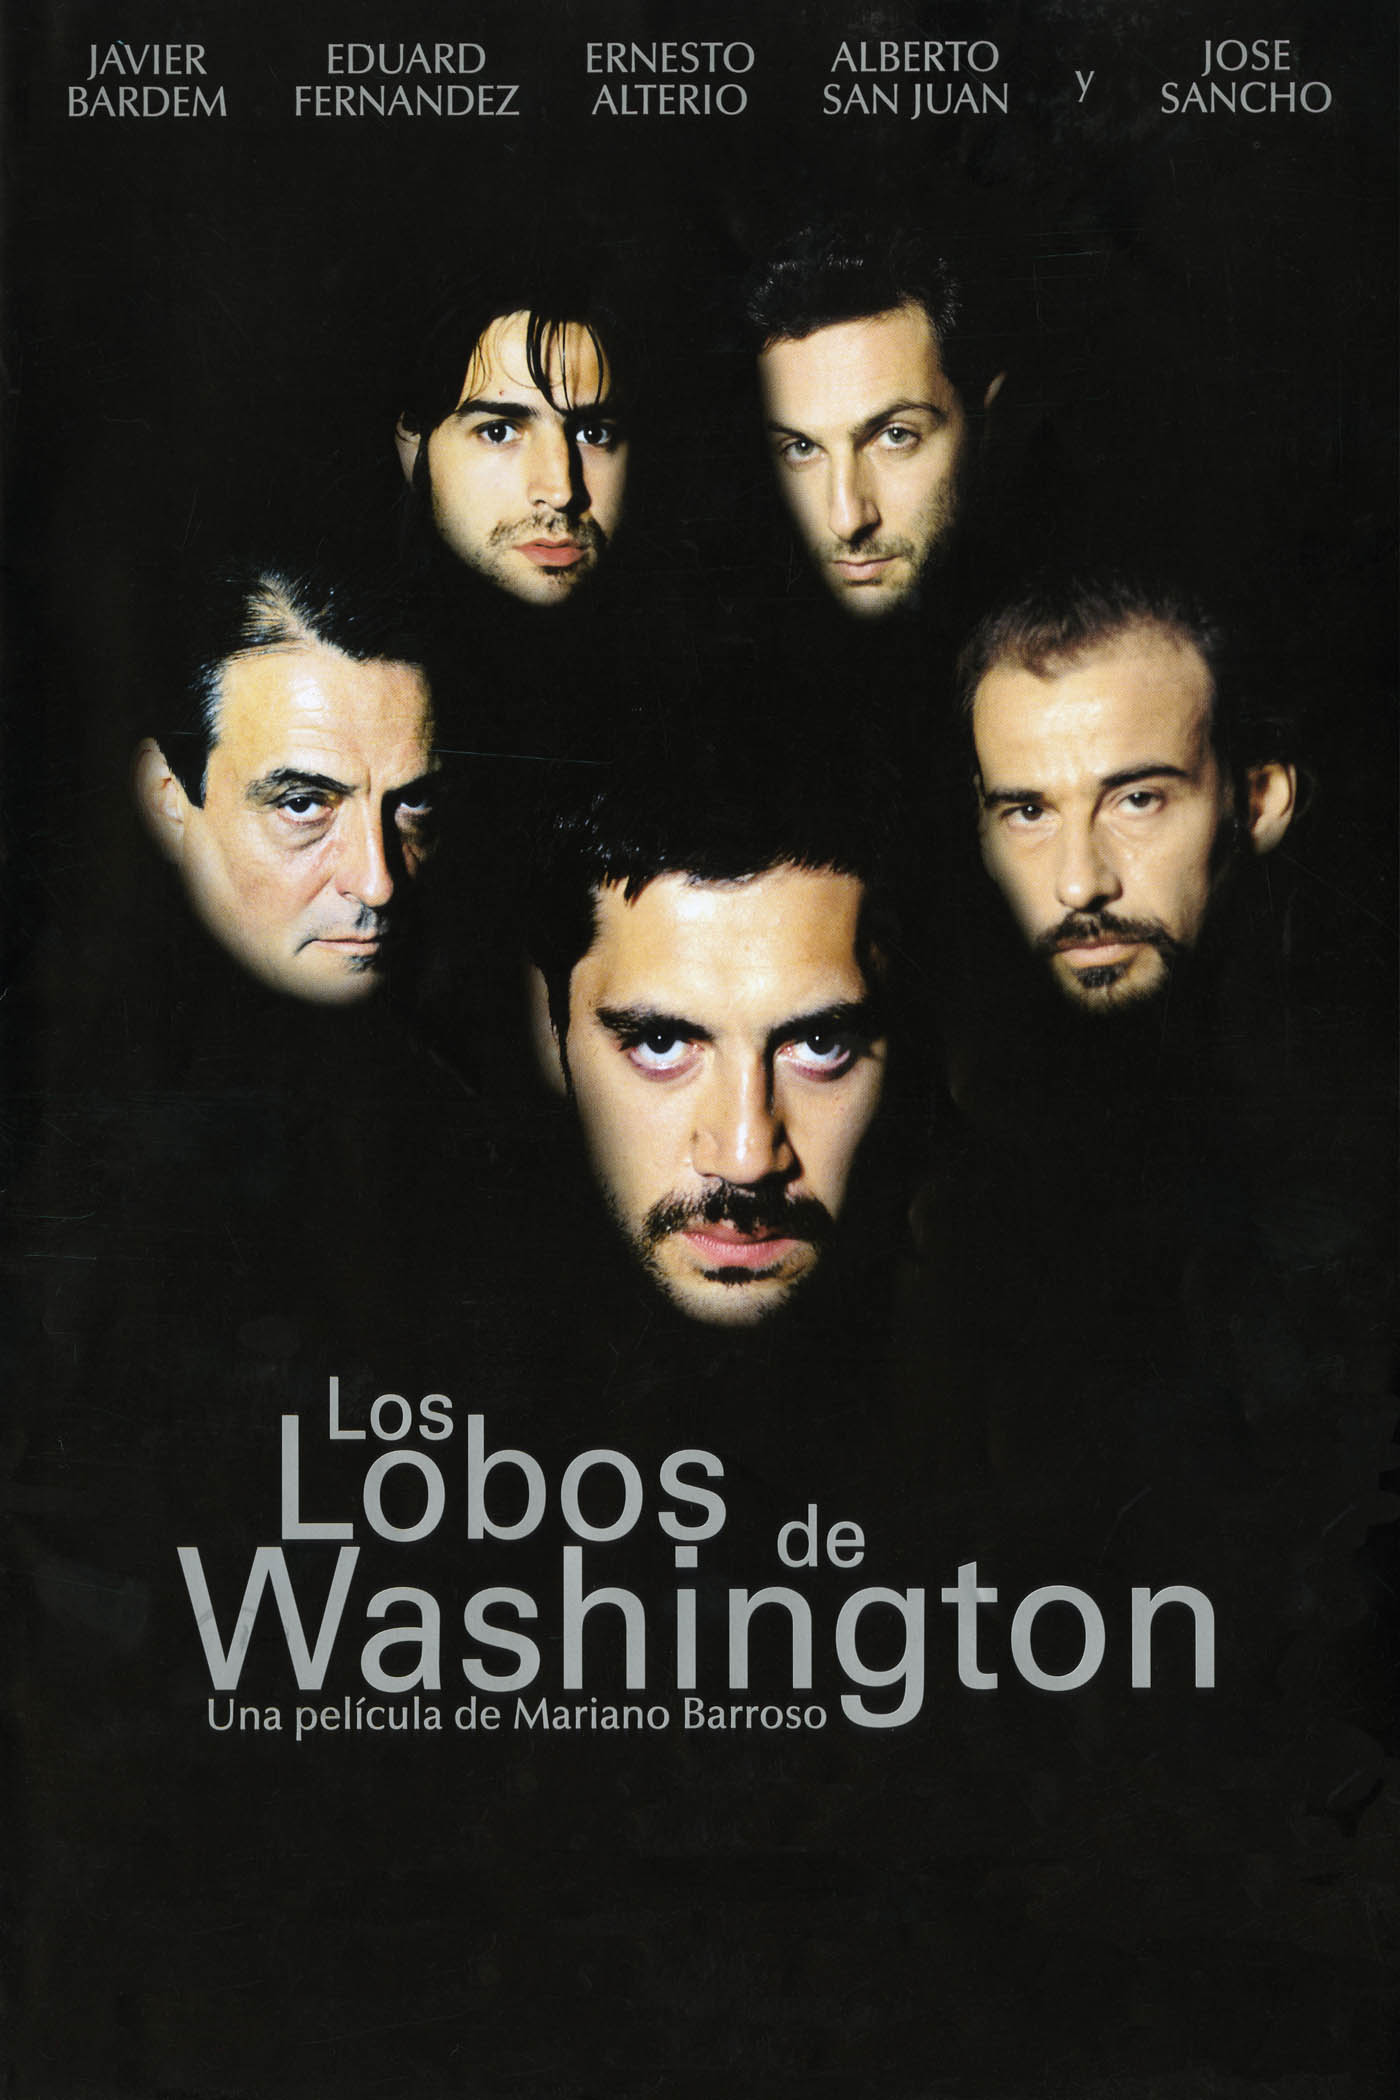 Los lobos - Poster.jpg